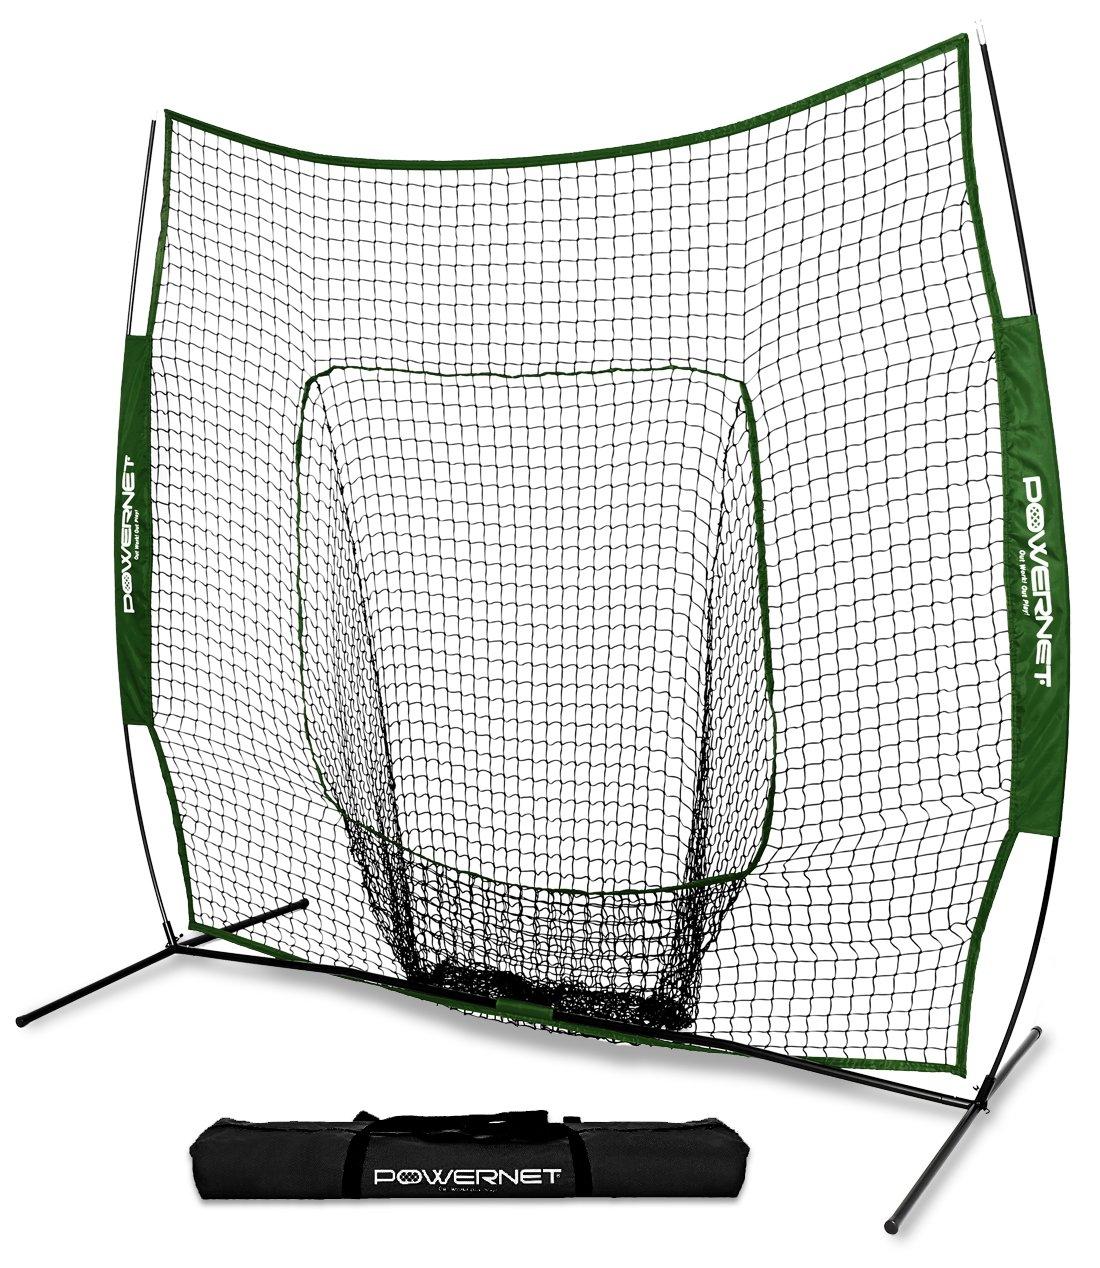 PowerNet Team Color Baseball Softball 7x7 Hitting Net w/Bow Frame (Green) by PowerNet